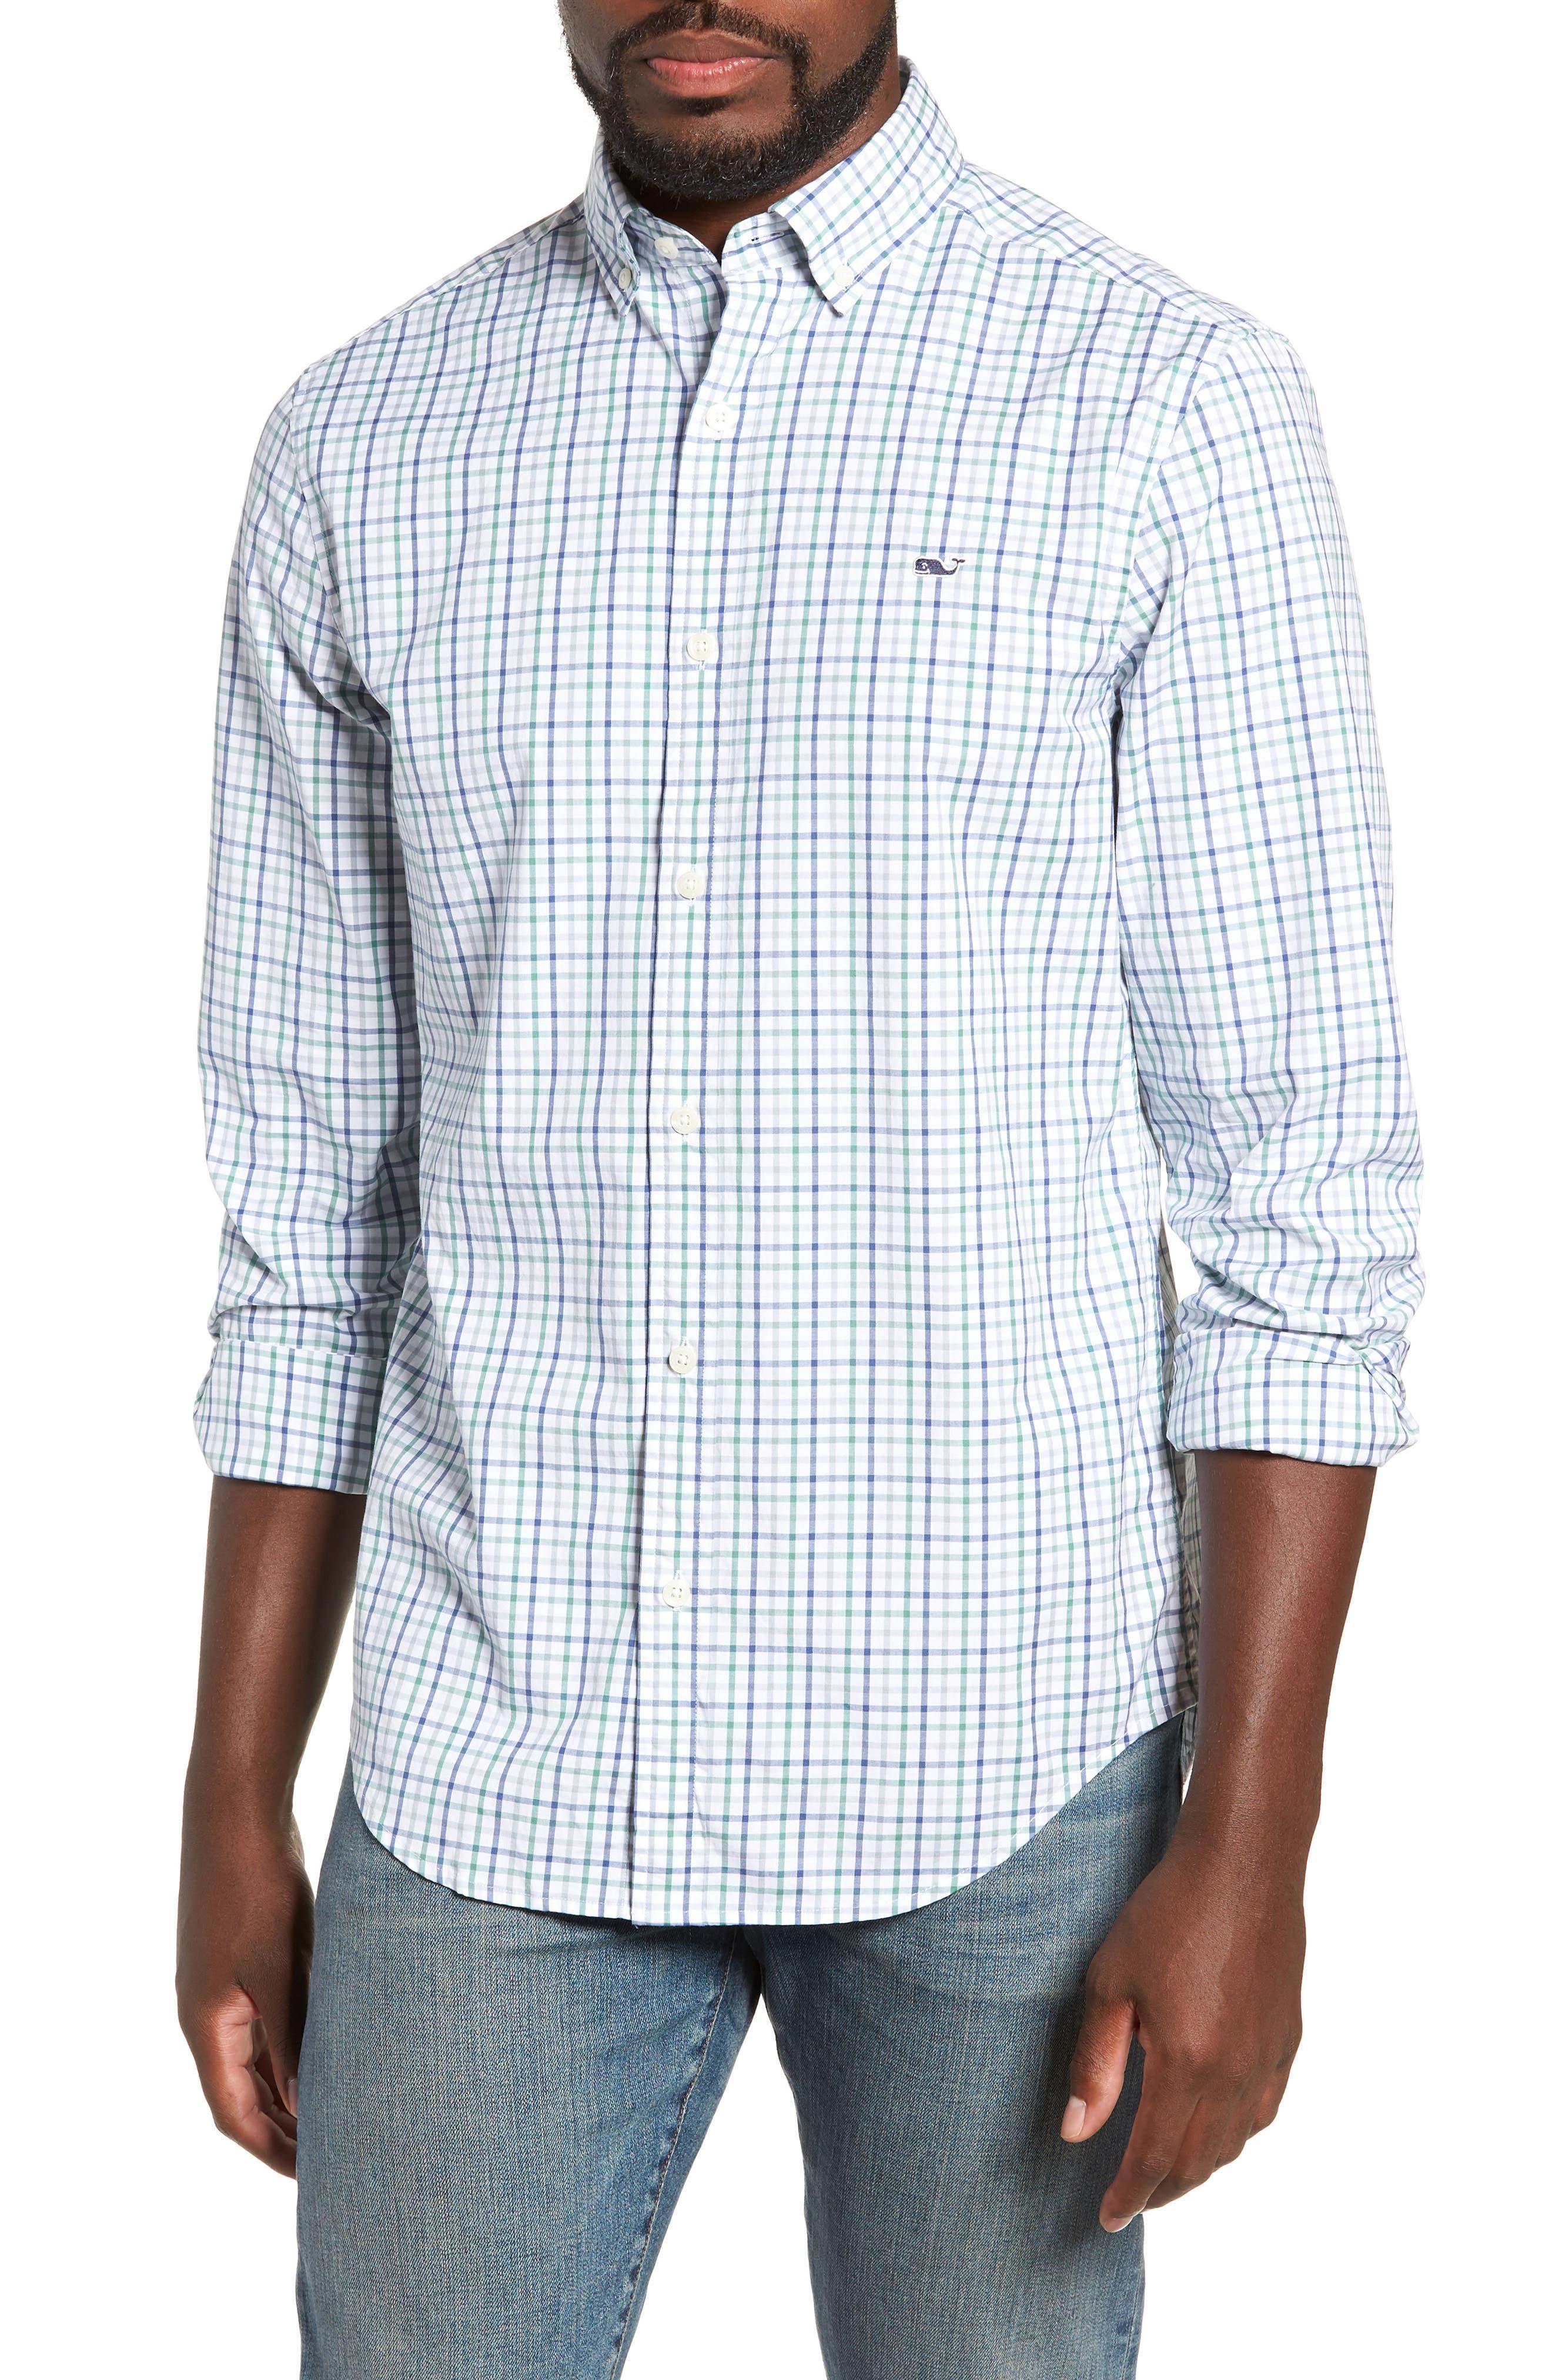 Vineyard Vines Classic Fit Sport Shirt, Green